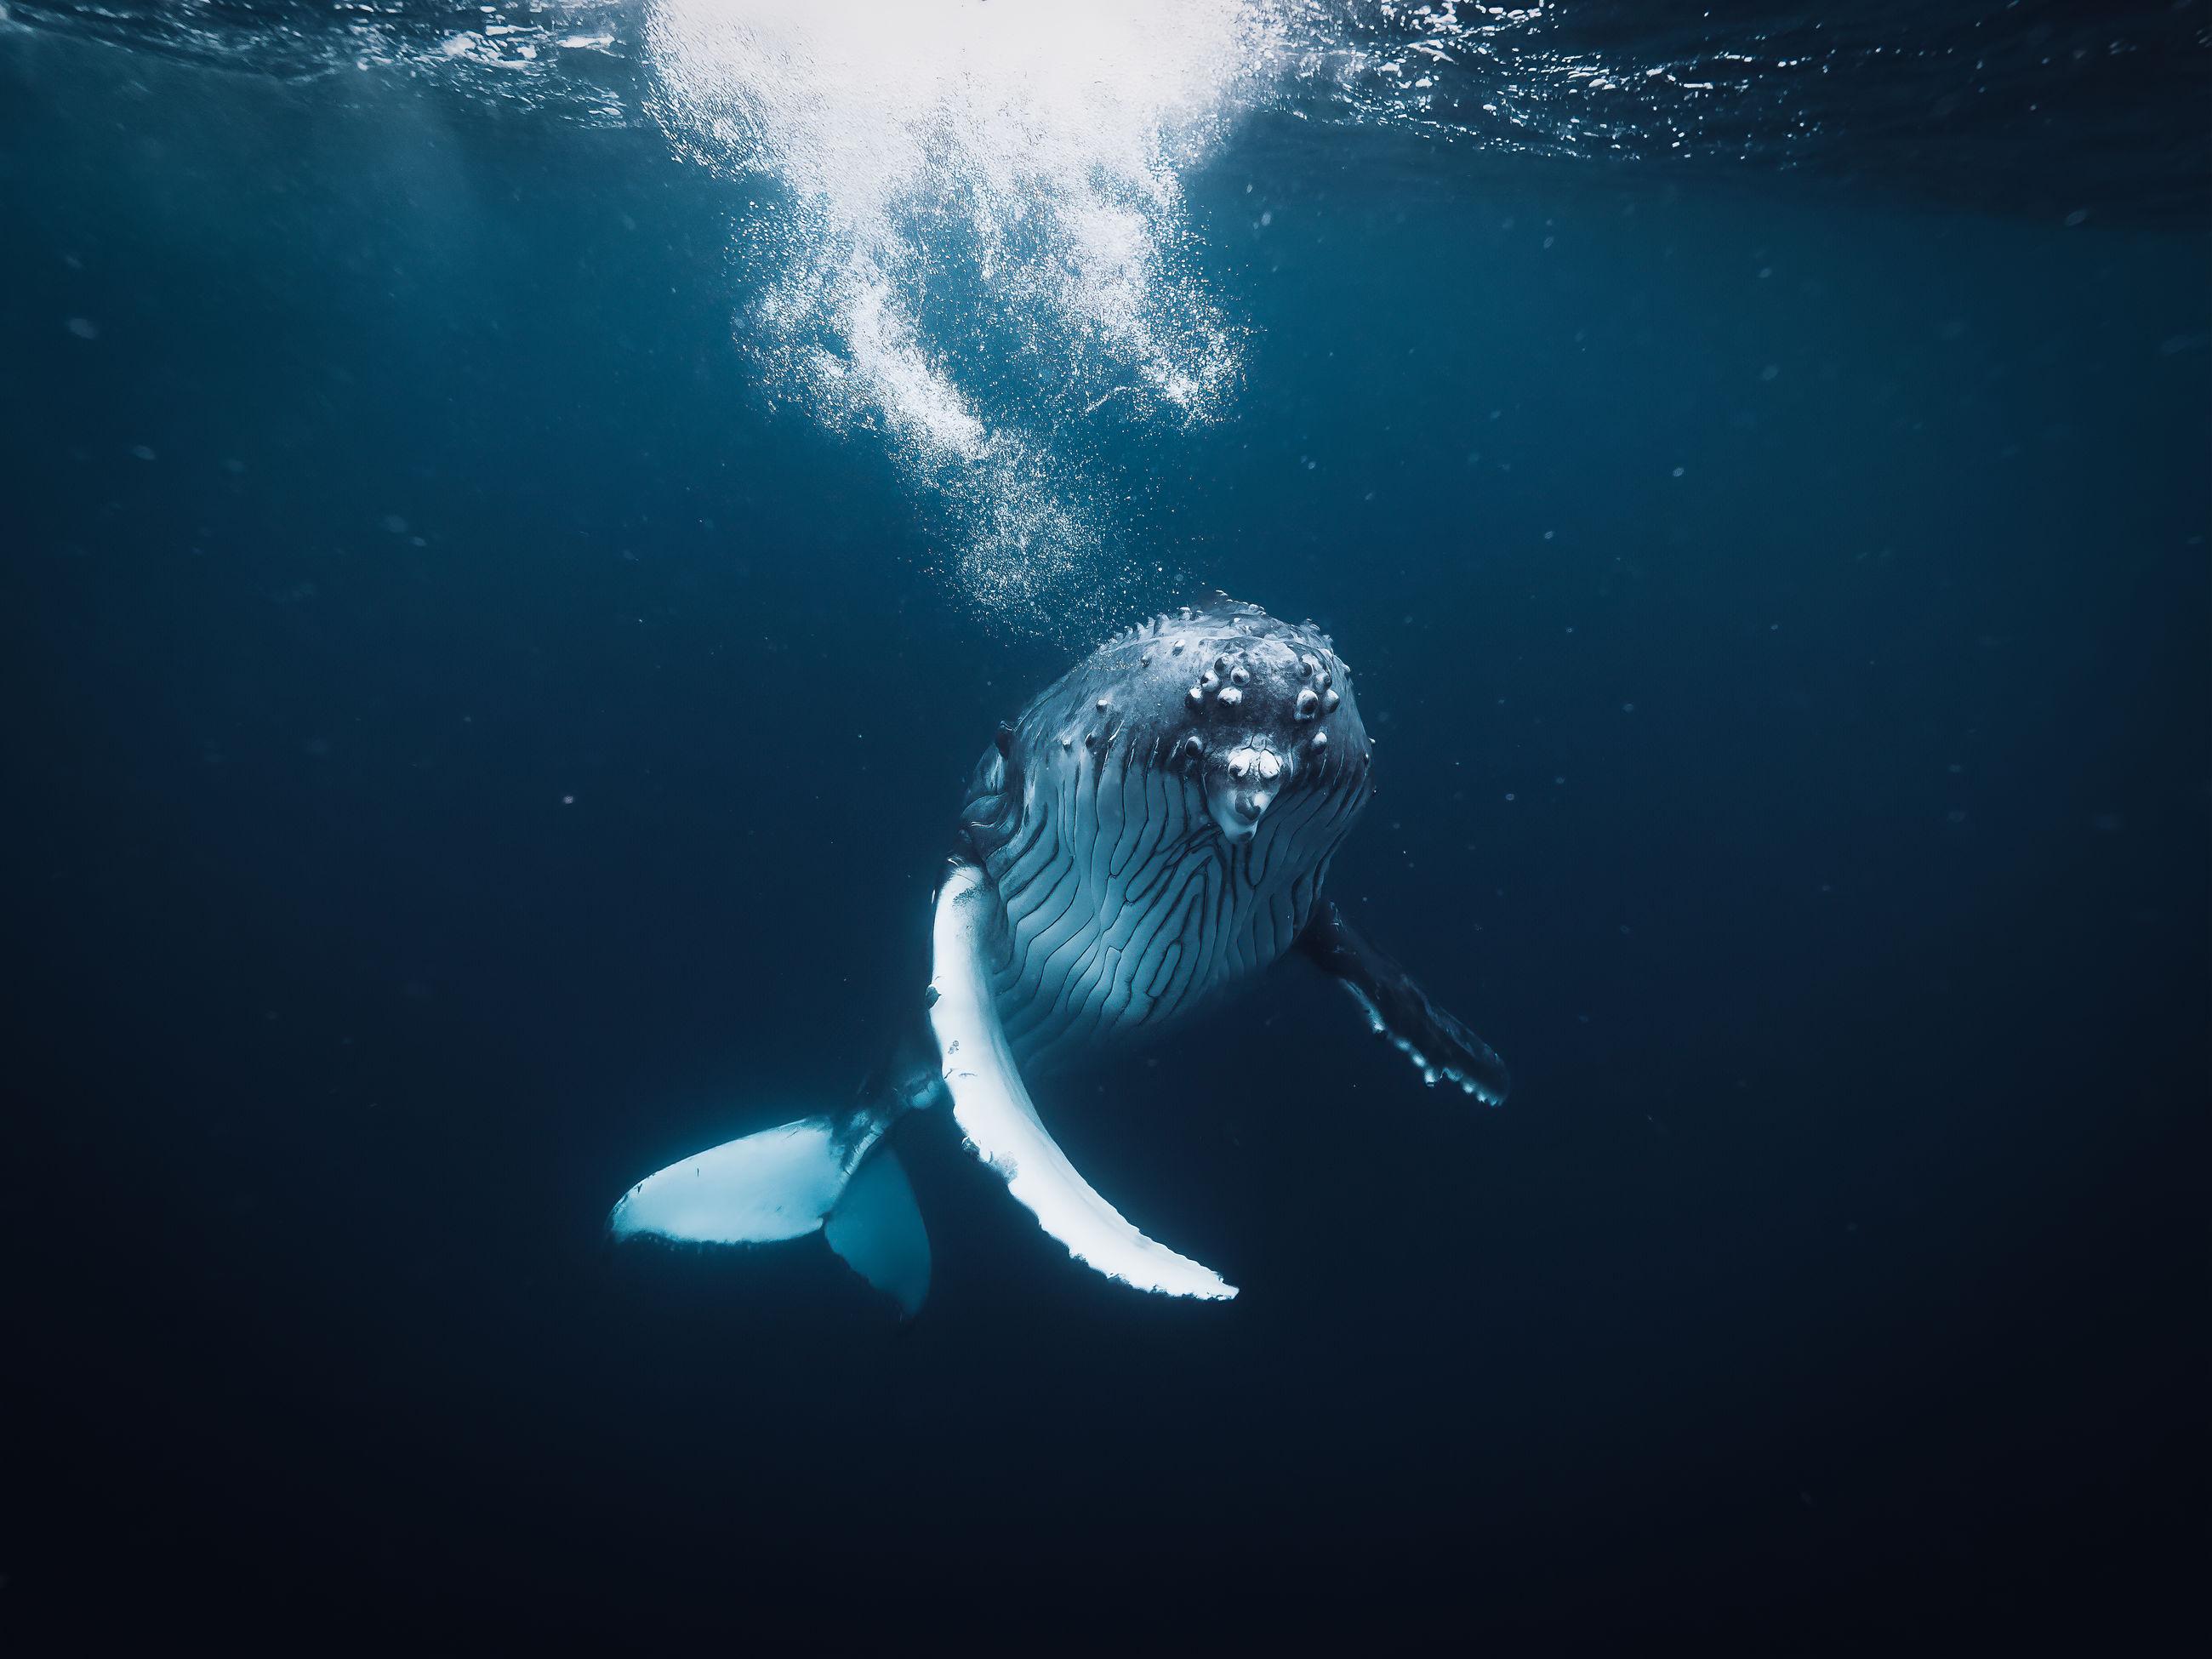 water, animal wildlife, swimming, underwater, animal, sea, animal themes, animals in the wild, one animal, undersea, vertebrate, sea life, marine, nature, no people, fish, outdoors, mammal, day